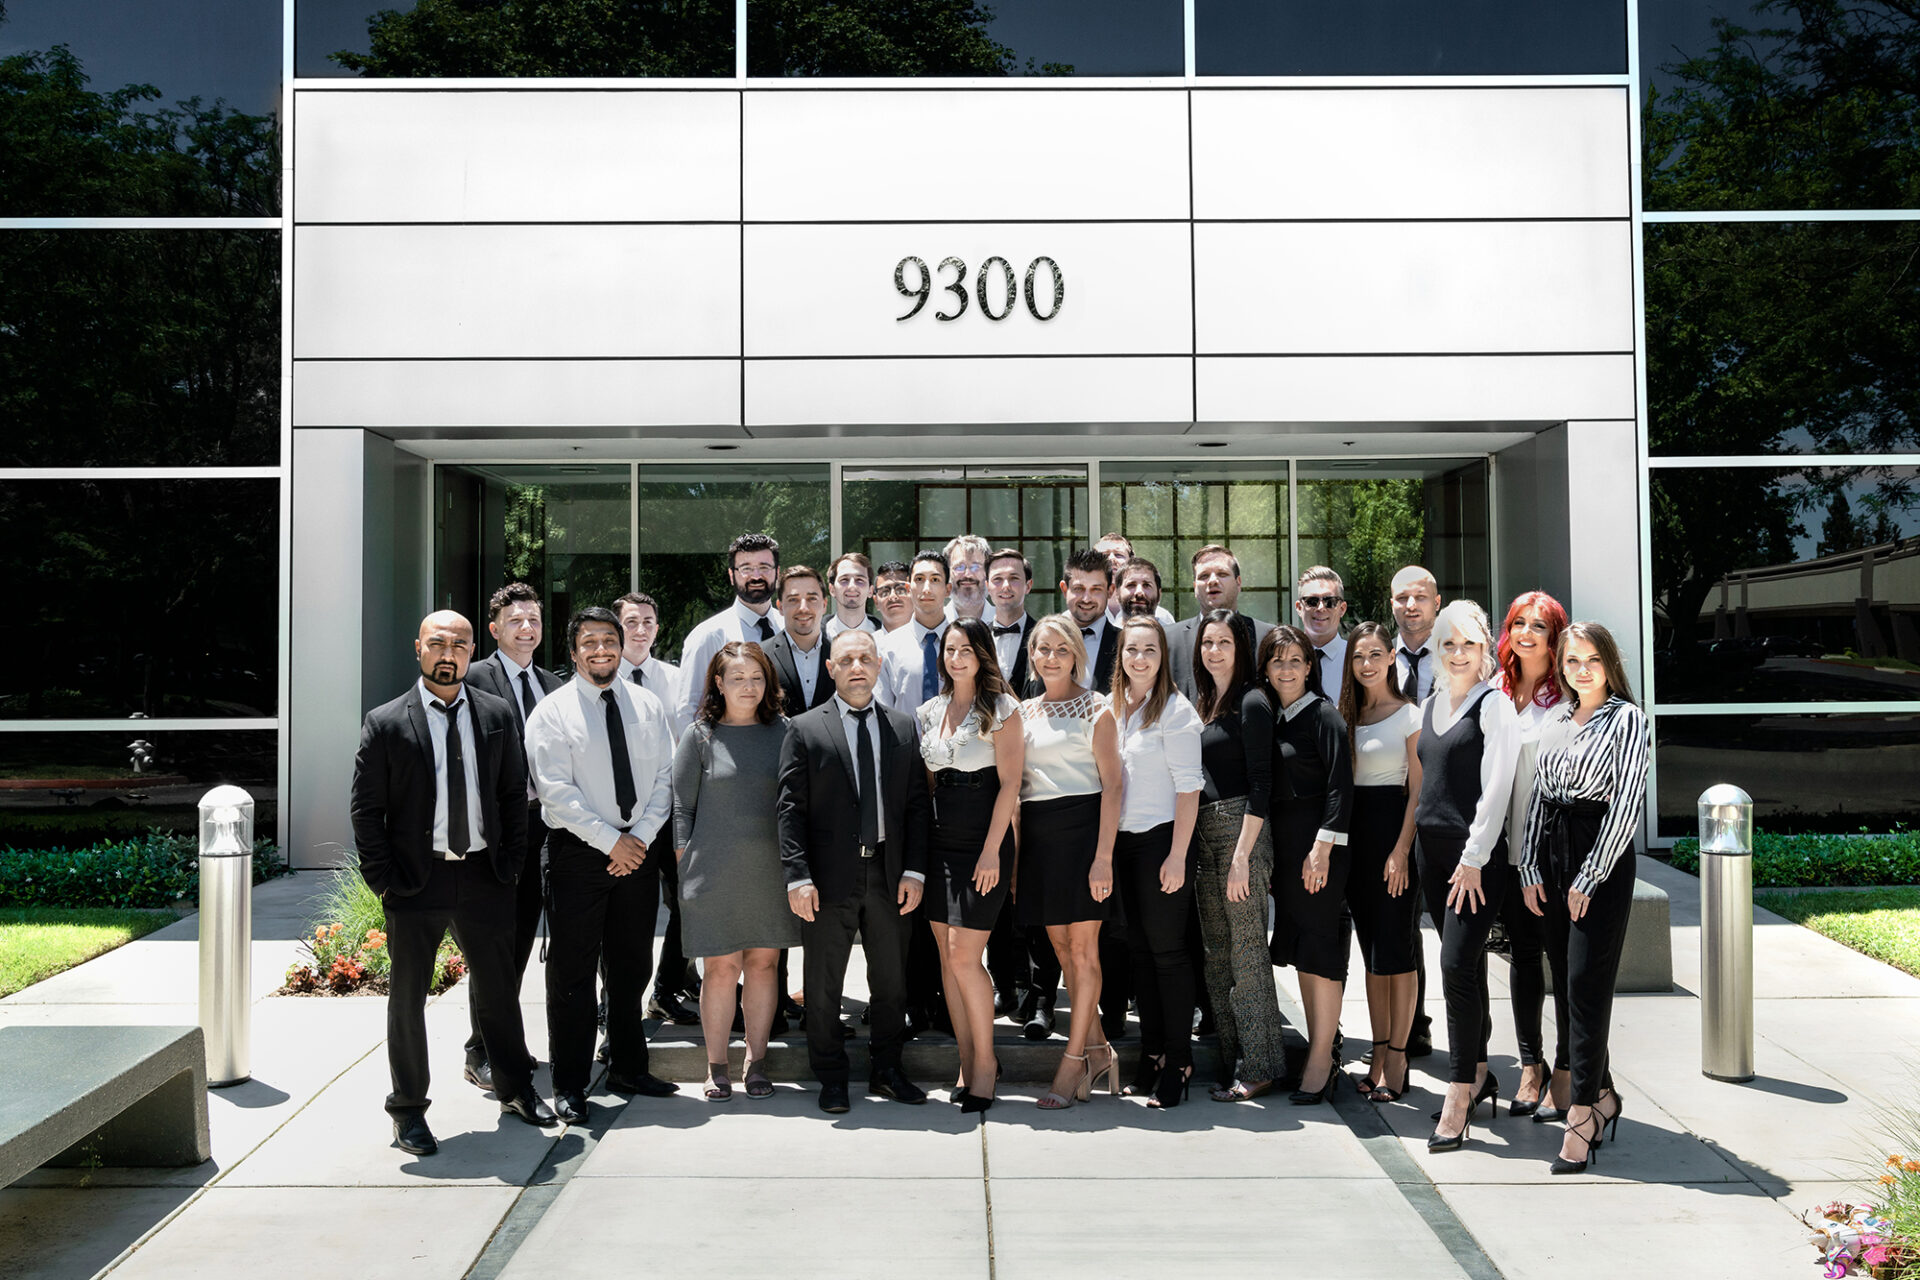 RCG Auto Transport Brokering team